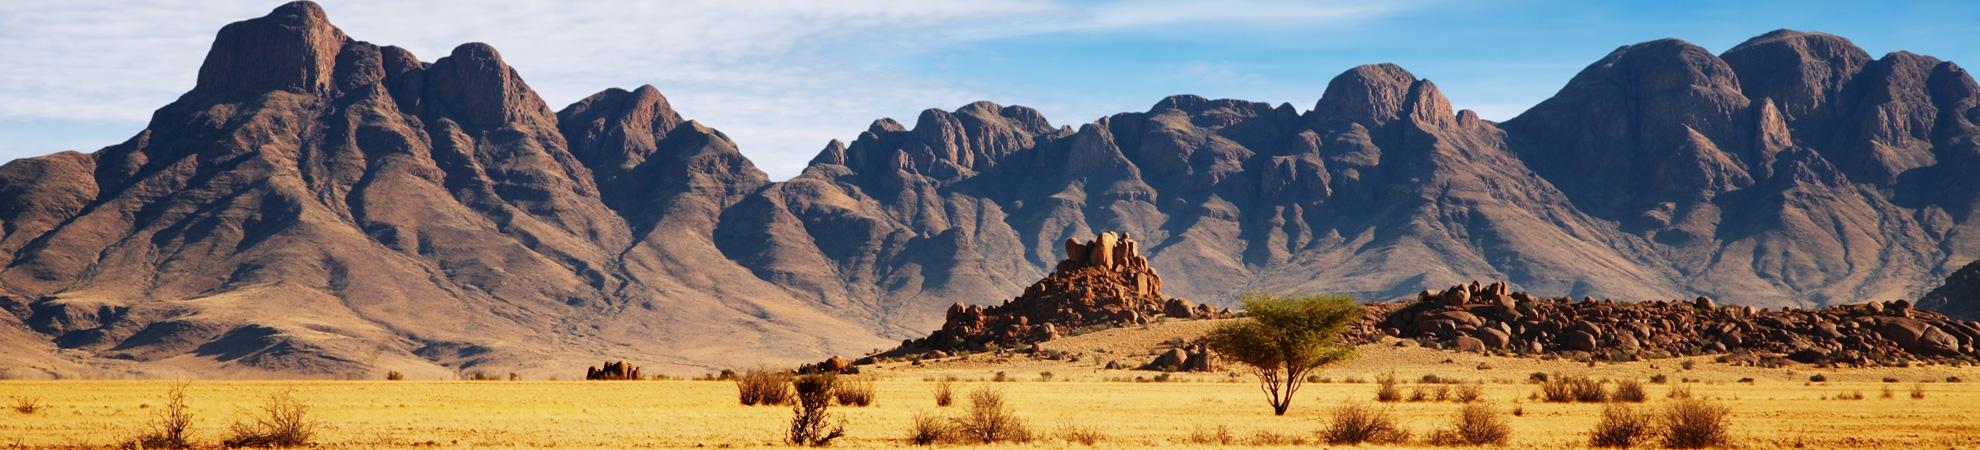 Voyage Désert de Namib